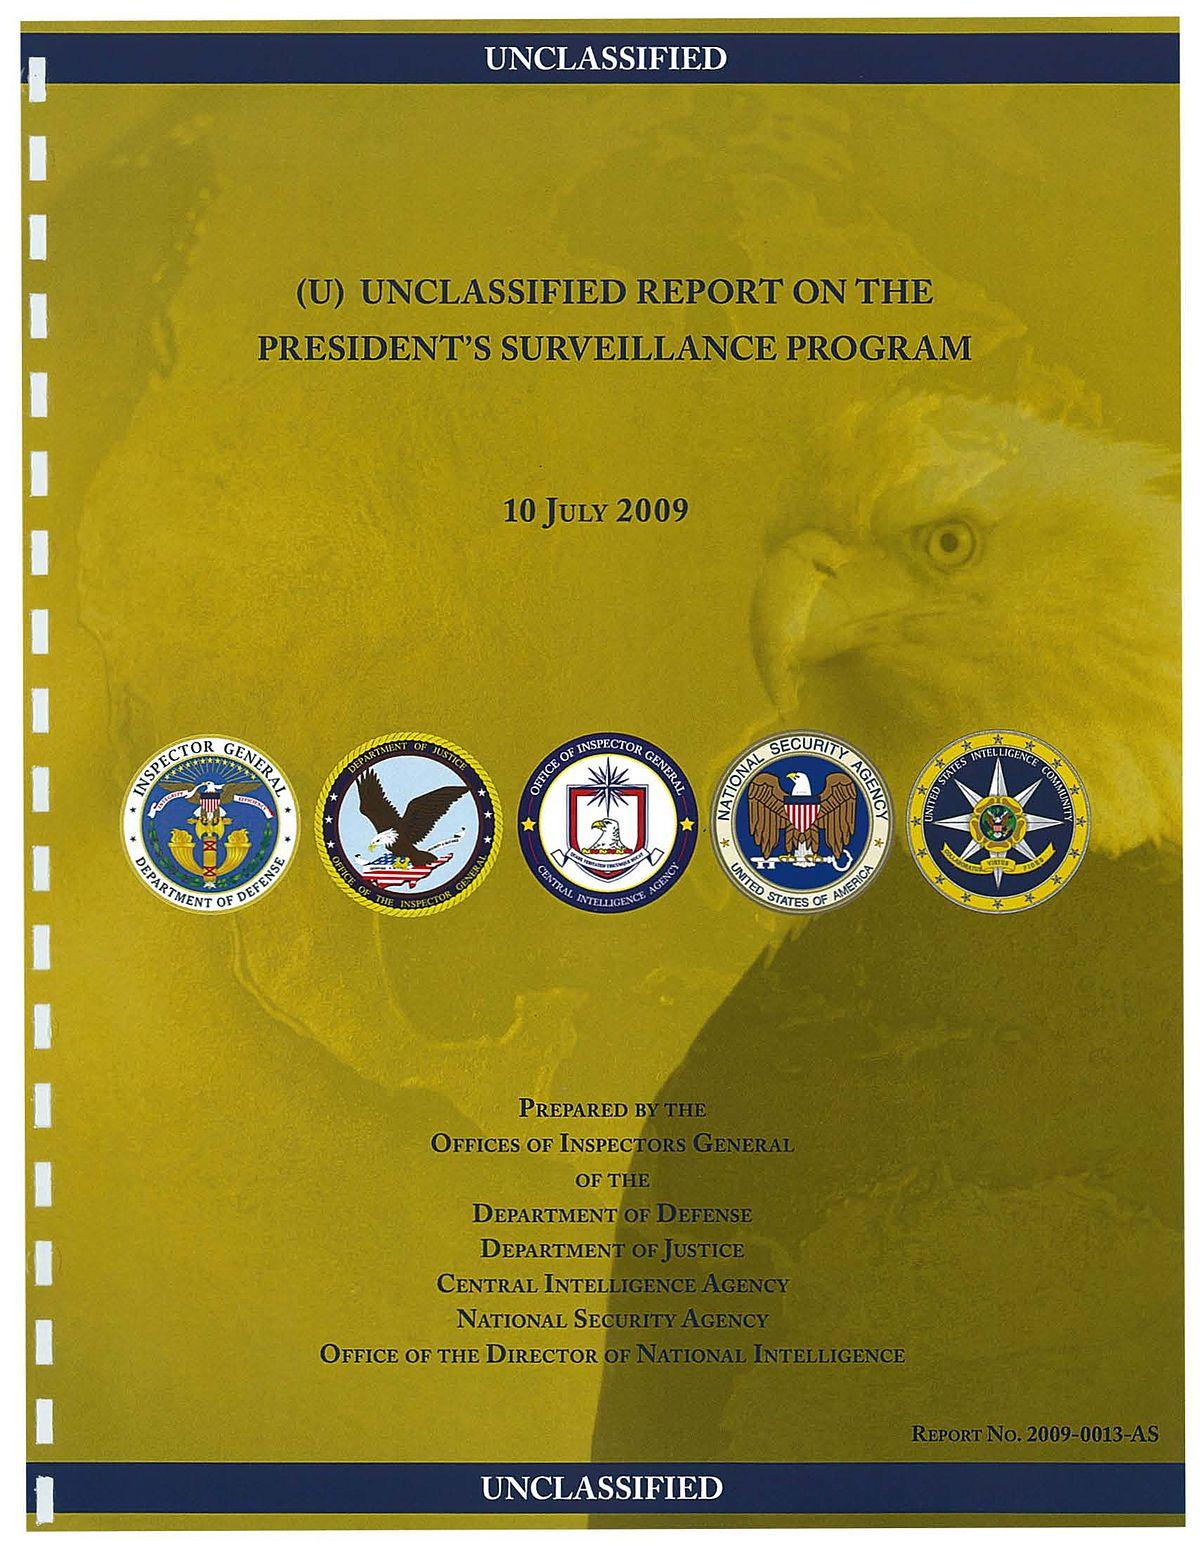 presidents surveillance program wikipedia